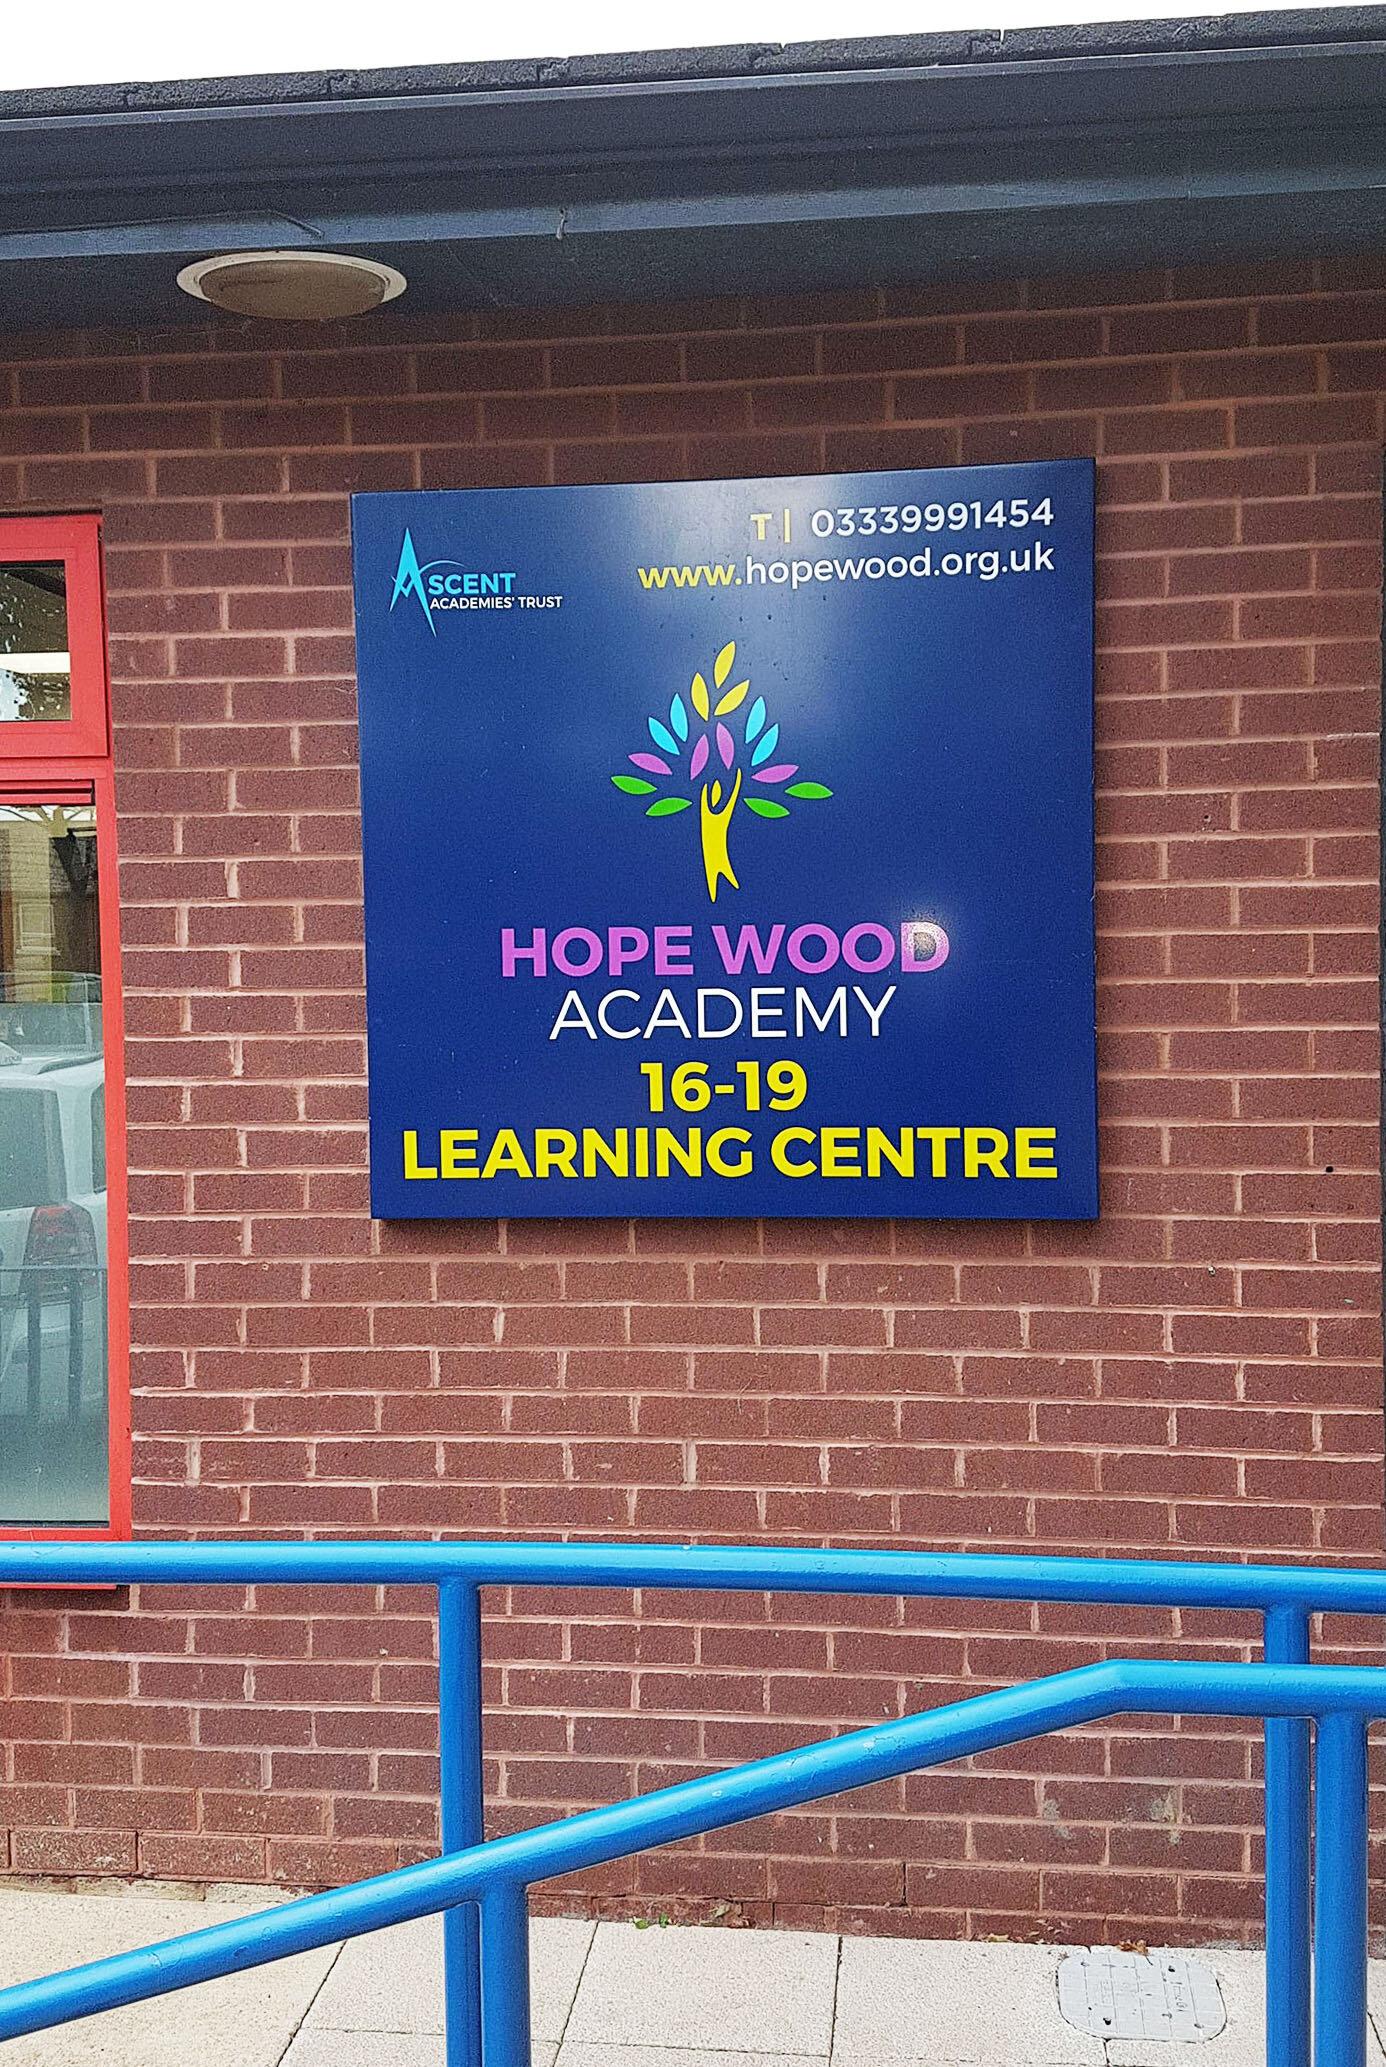 Hope Wood Academy